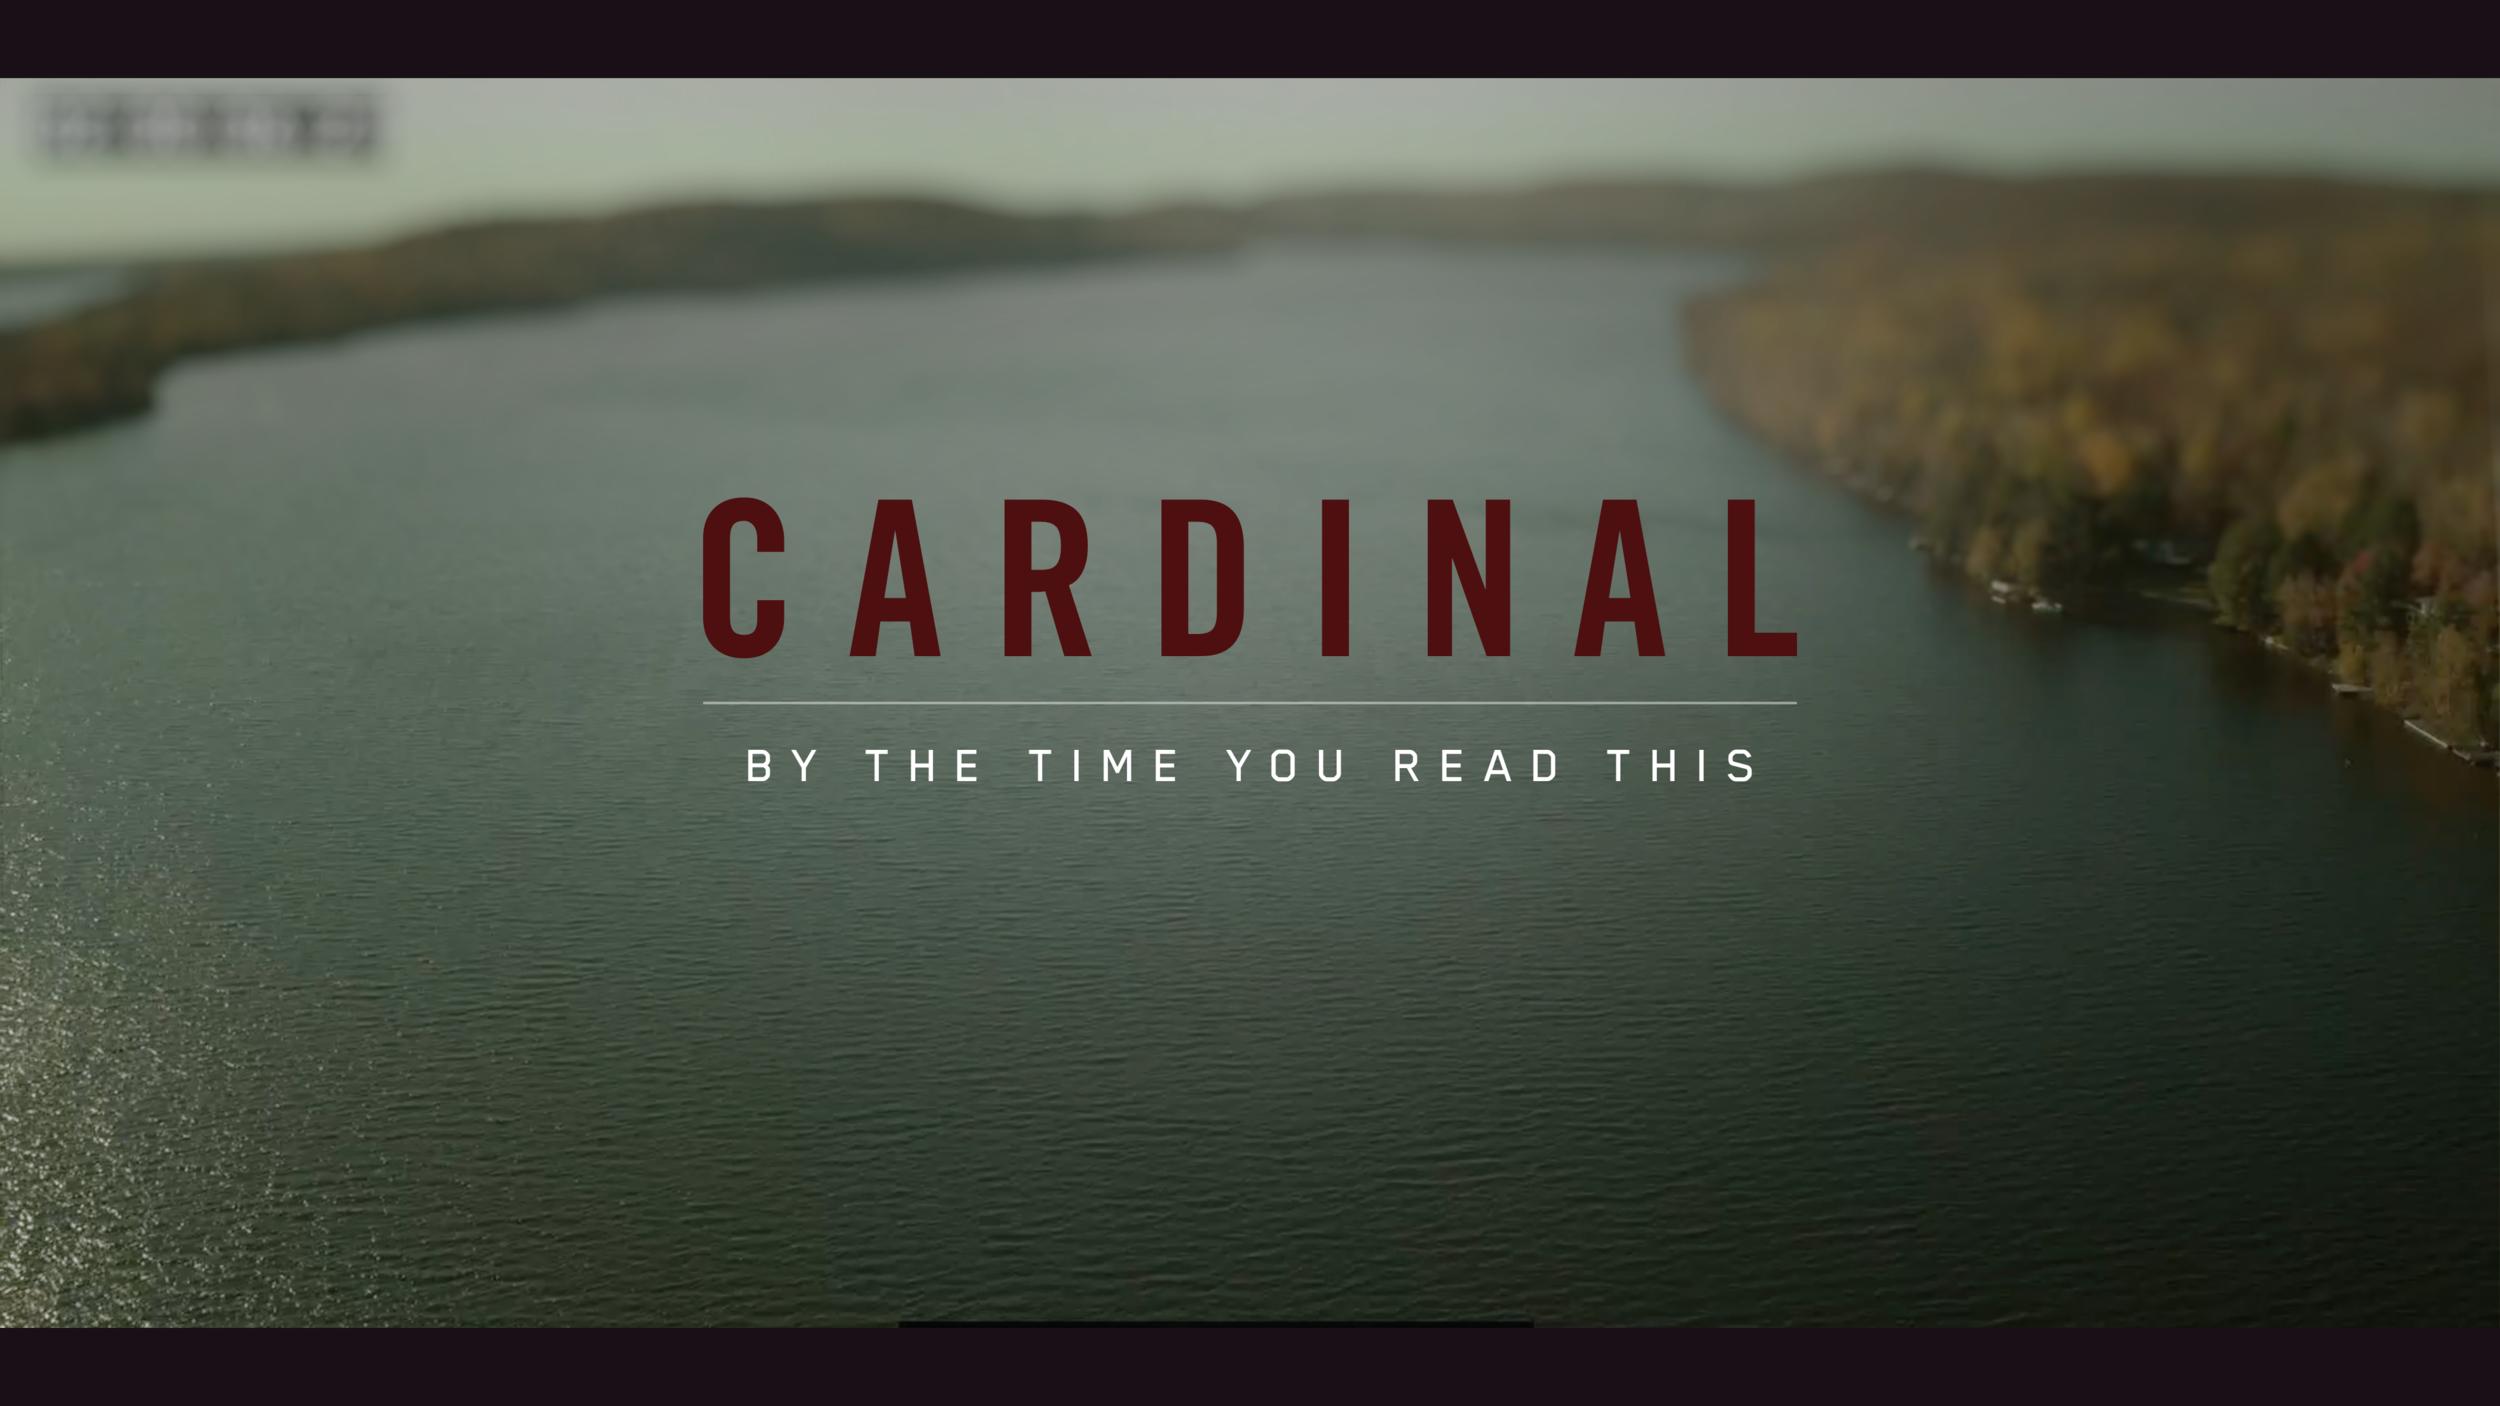 CardinalS3Intro Alternate Logo Plate 2.png